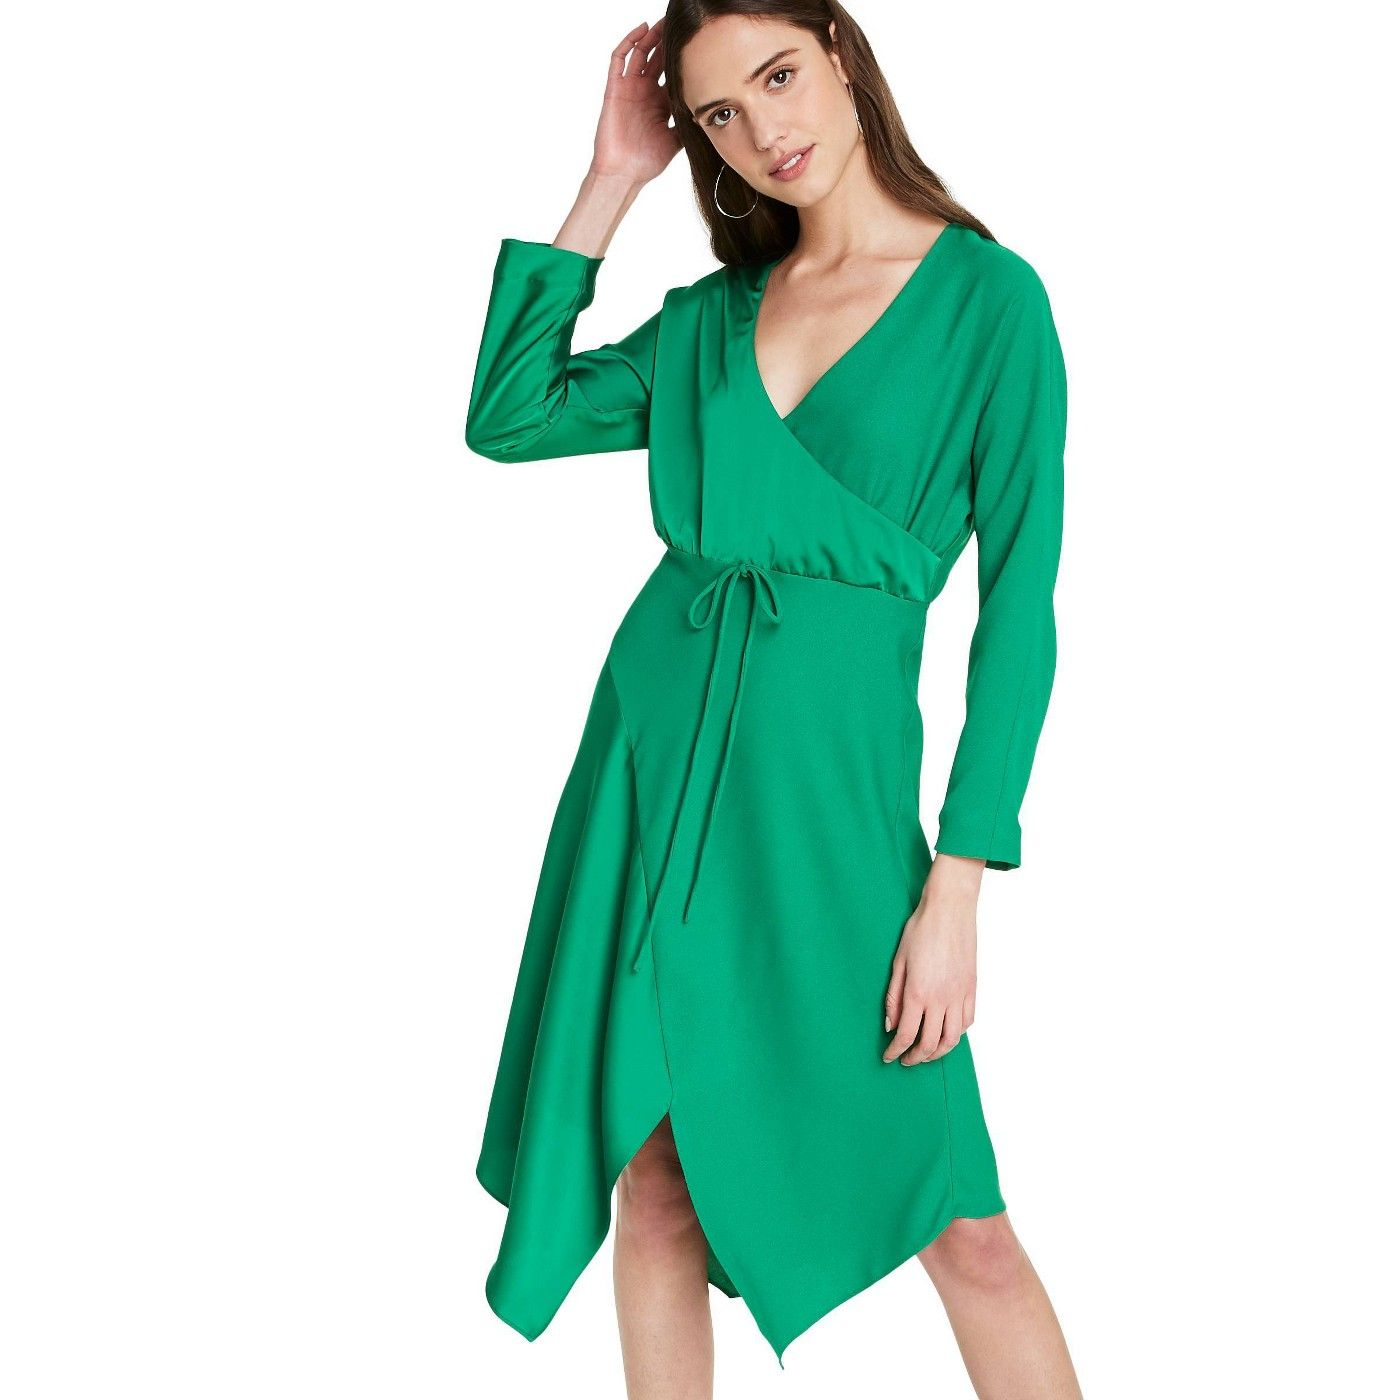 Women S Wrap Dress Cushnie For Target Regular Plus Emerald Green Sponsored Dress Affiliate Cushnie Women Womens Wrap Dress Wrap Dress Dresses [ 1400 x 1400 Pixel ]